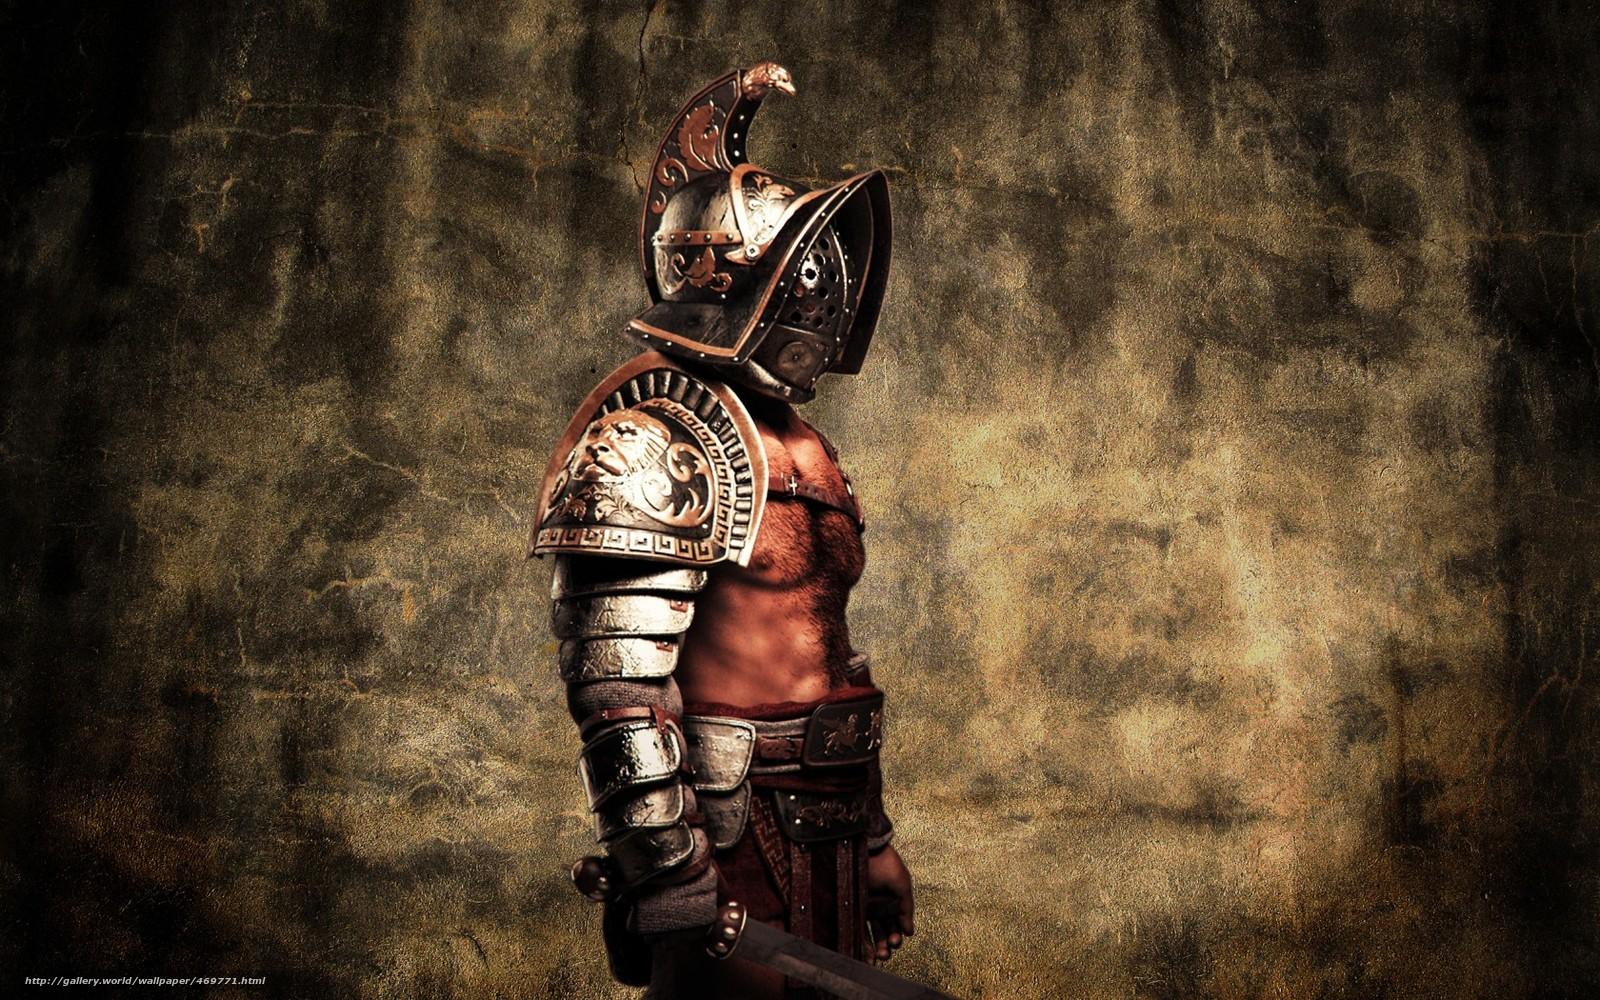 Download wallpaper gladiator Warrior gladius helmet 1600x1000